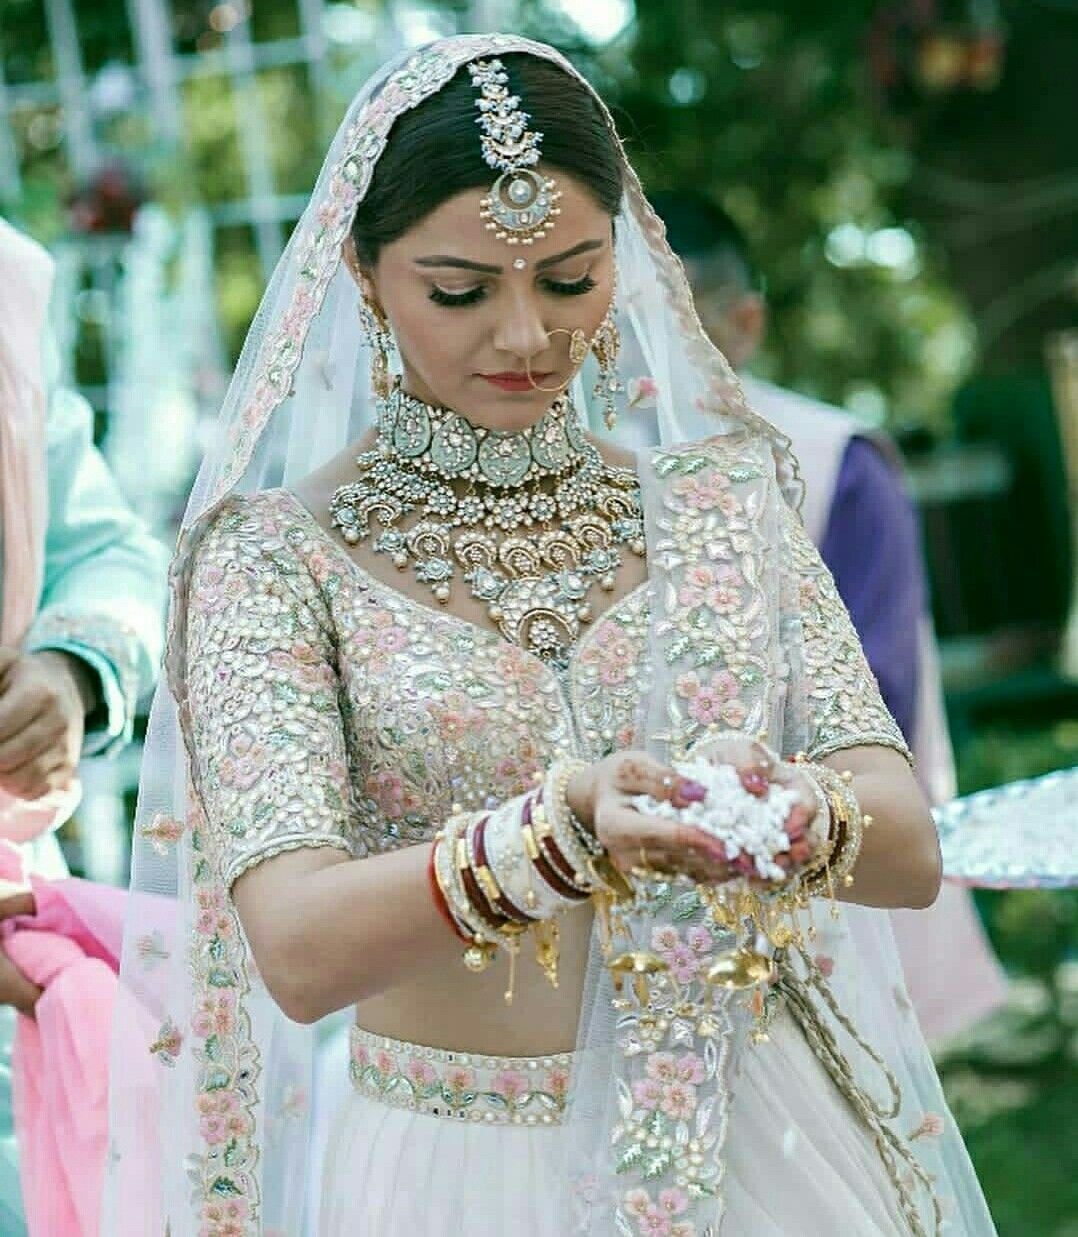 Hindu wedding dress  Pin by urmila jasawat on Bridal photography  Pinterest  Bridal